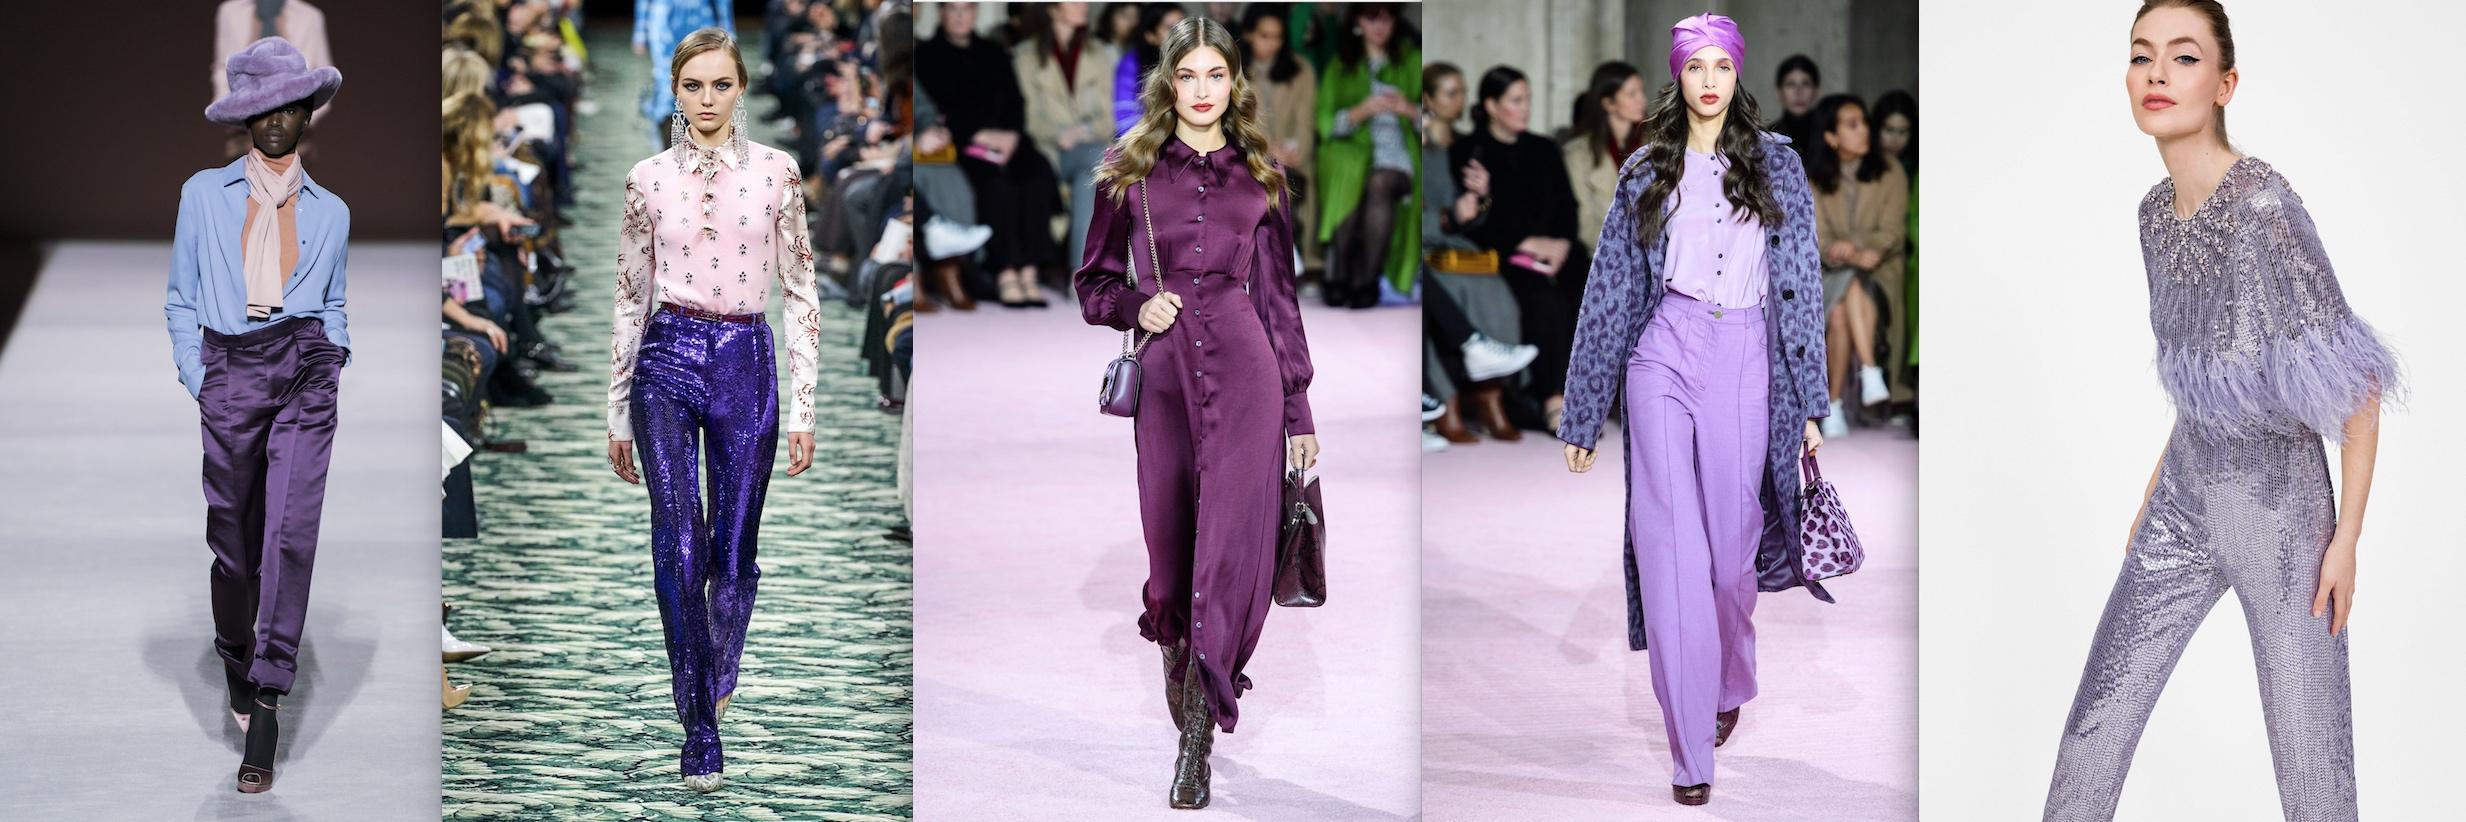 Fall 2019 Designer runway trends purple